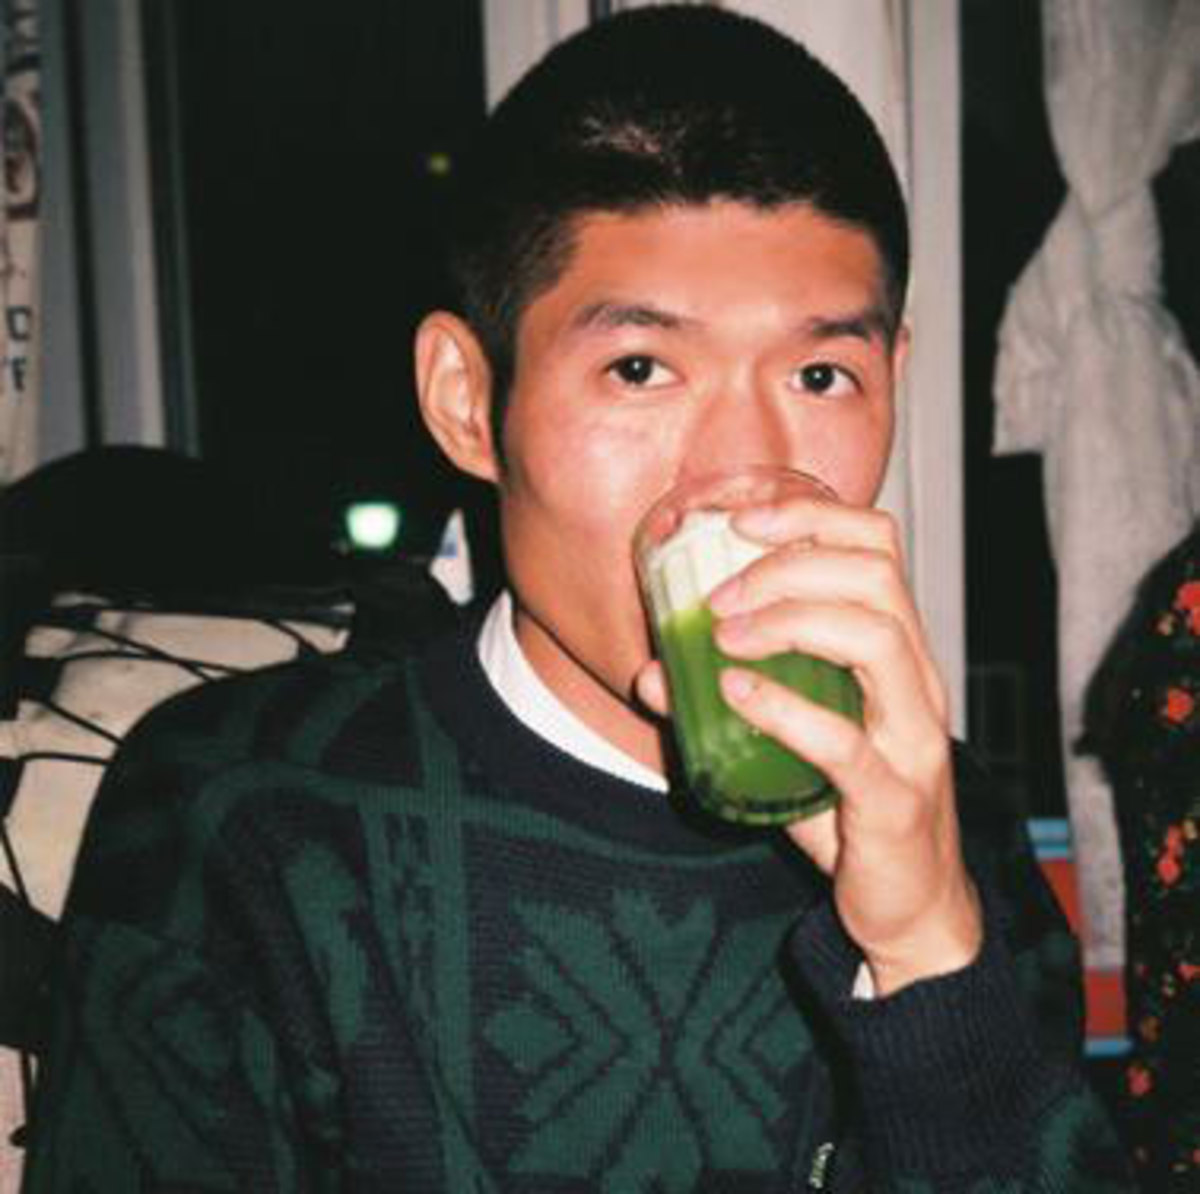 Ren Hang: Ο «απαγορευμένος» φωτογράφος δεν μένει πια εδώ